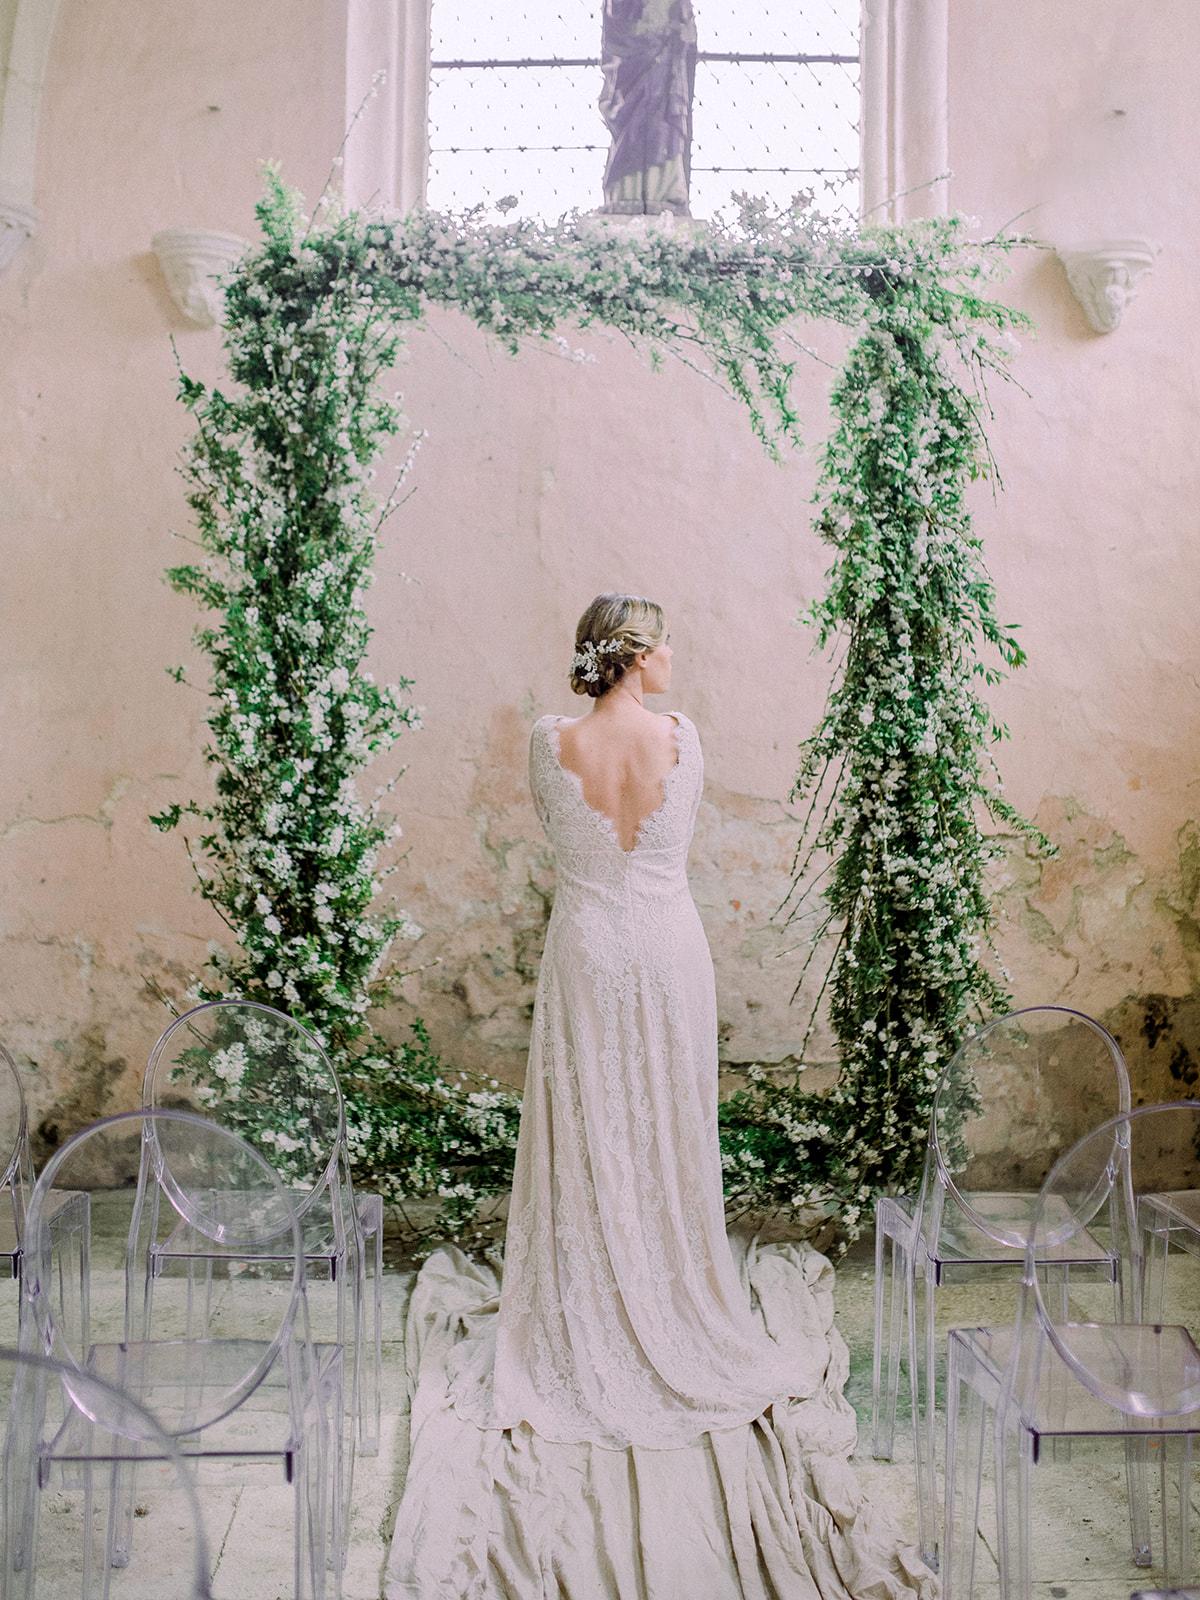 Green-Monsters-Bridal inspiration Floresie-126.jpg